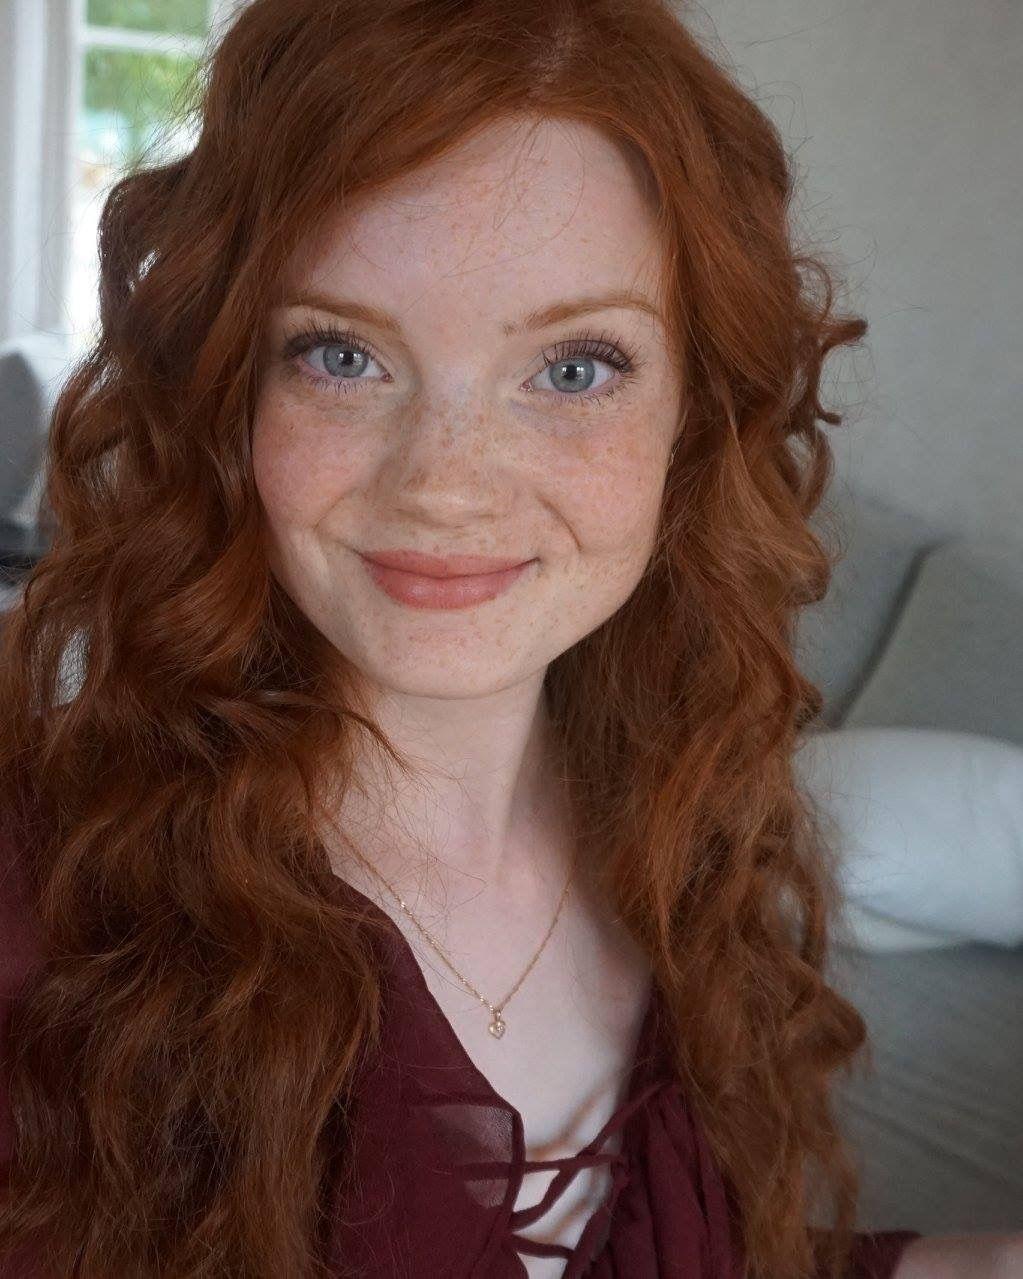 Riveting redhead riveting redheads pinterest redheads